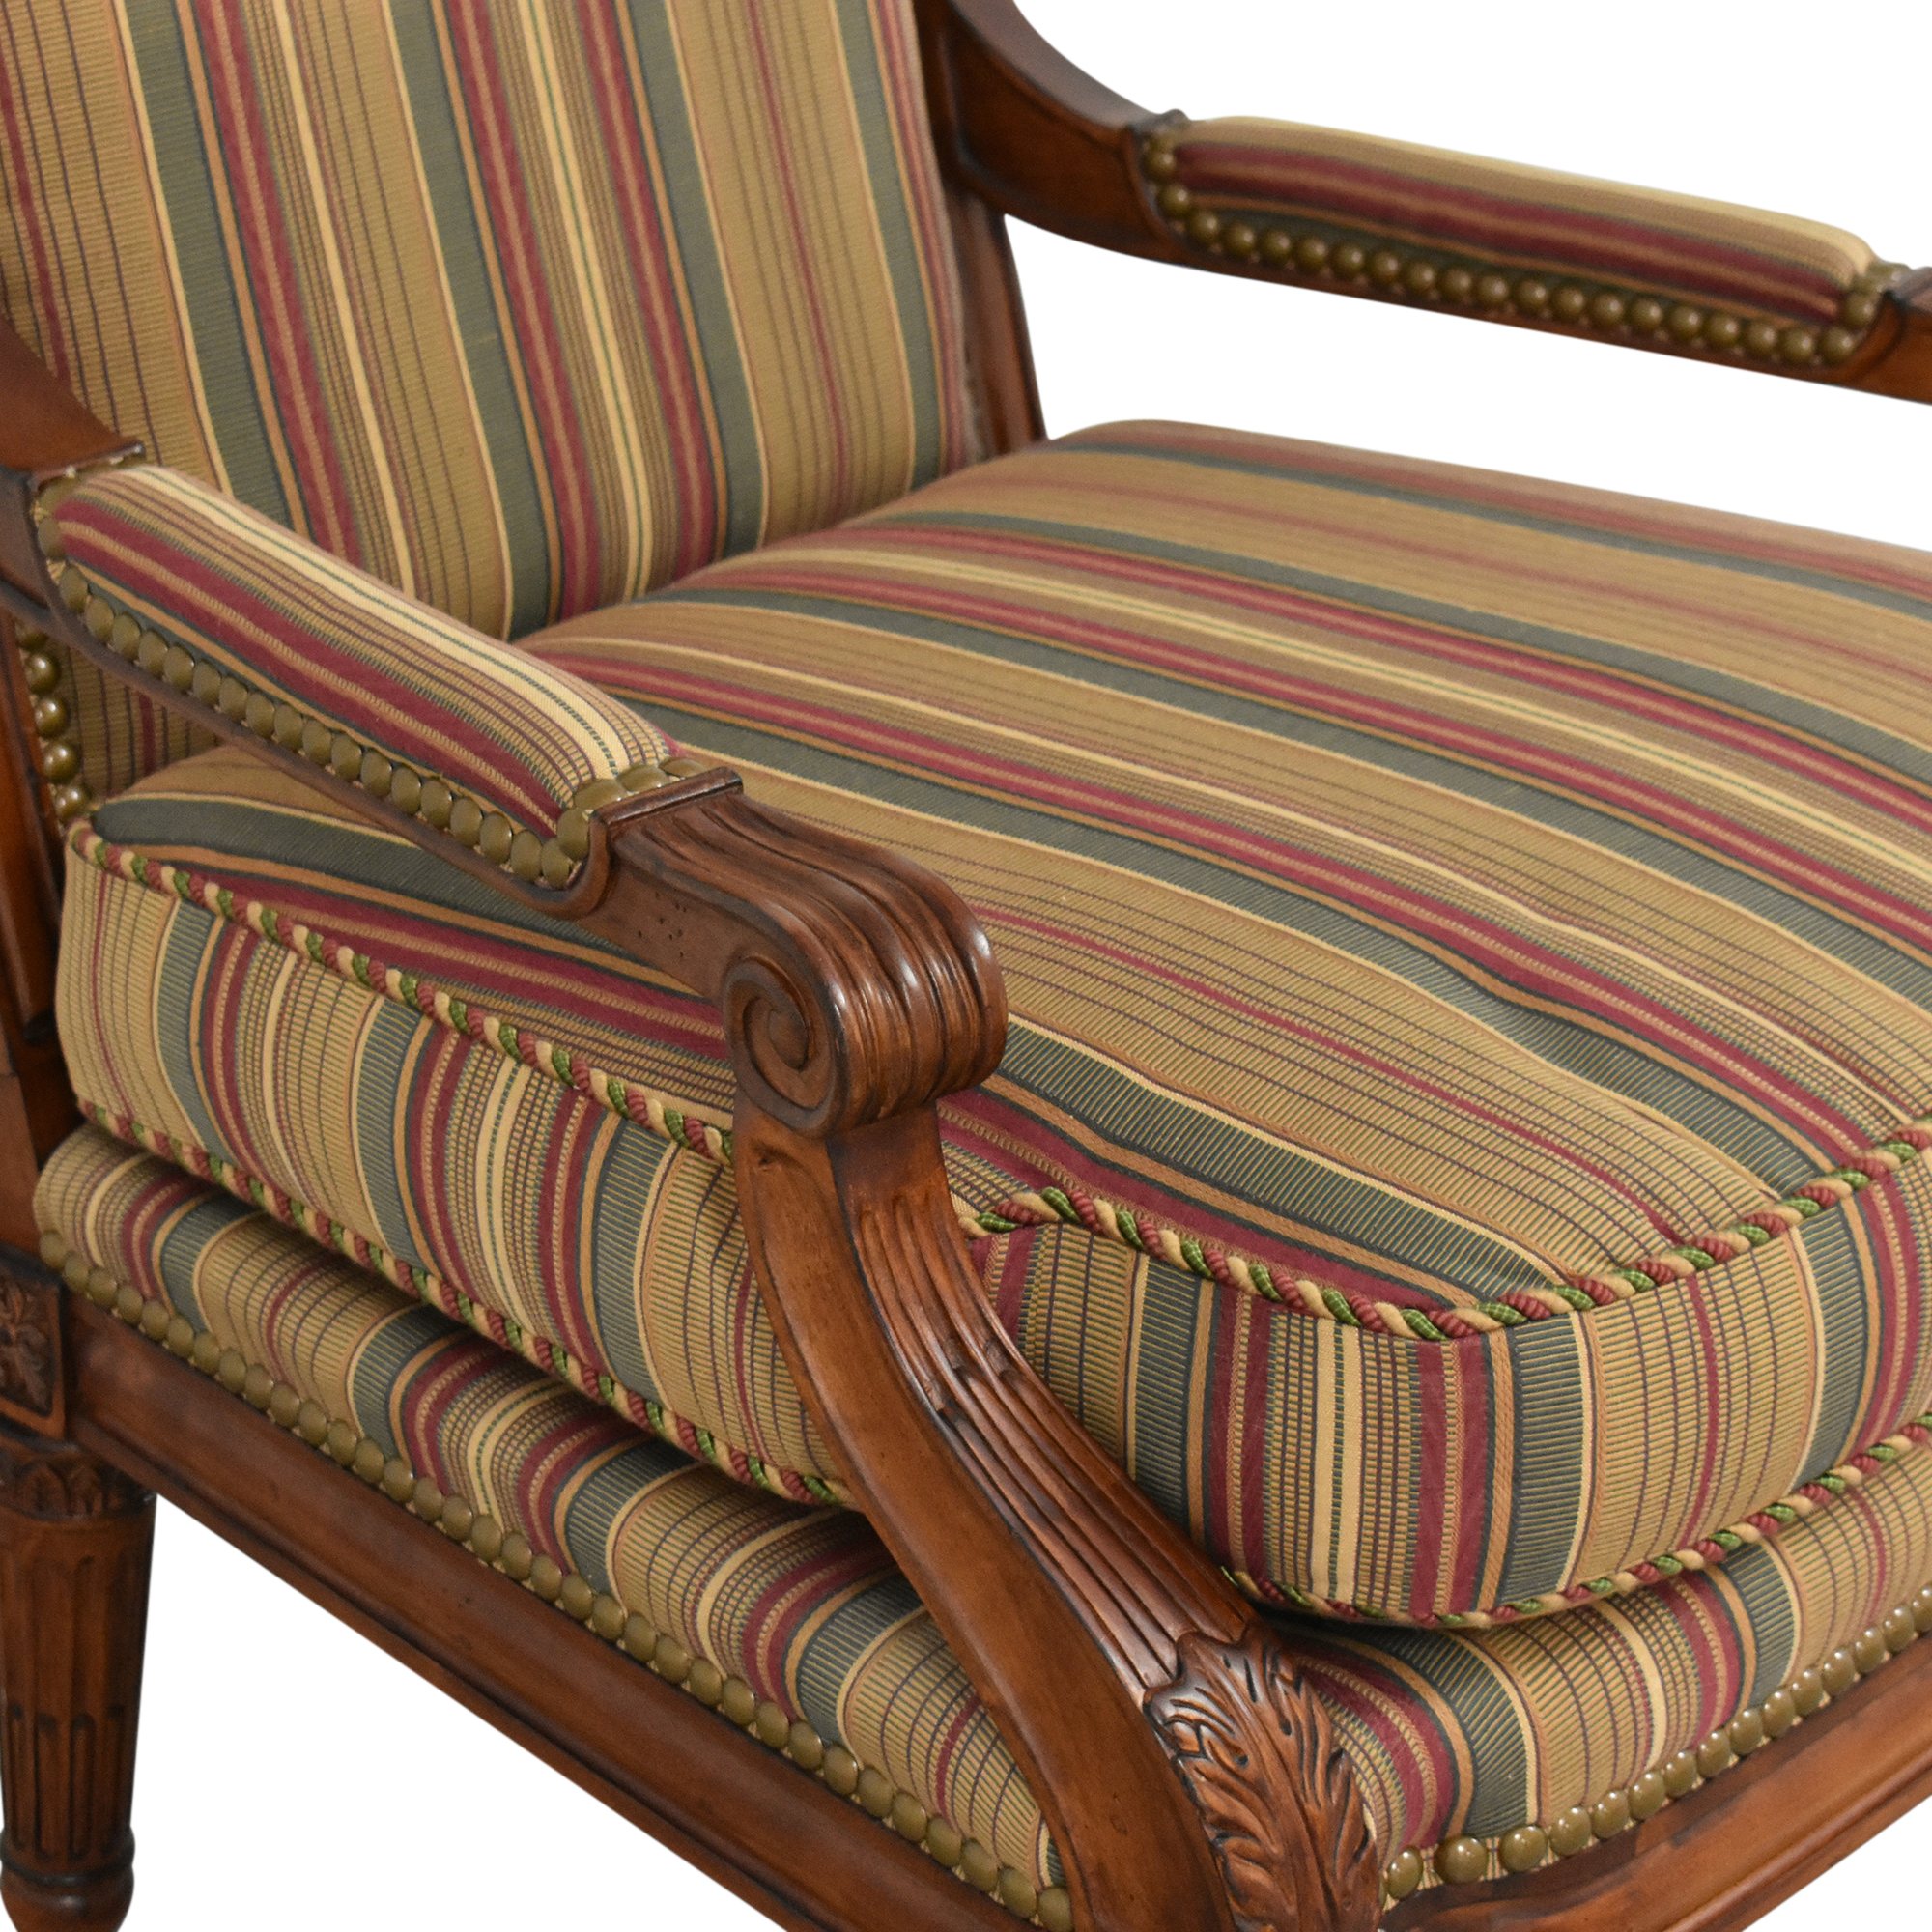 Century Furniture Century Furniture Striped Arm Chair dimensions